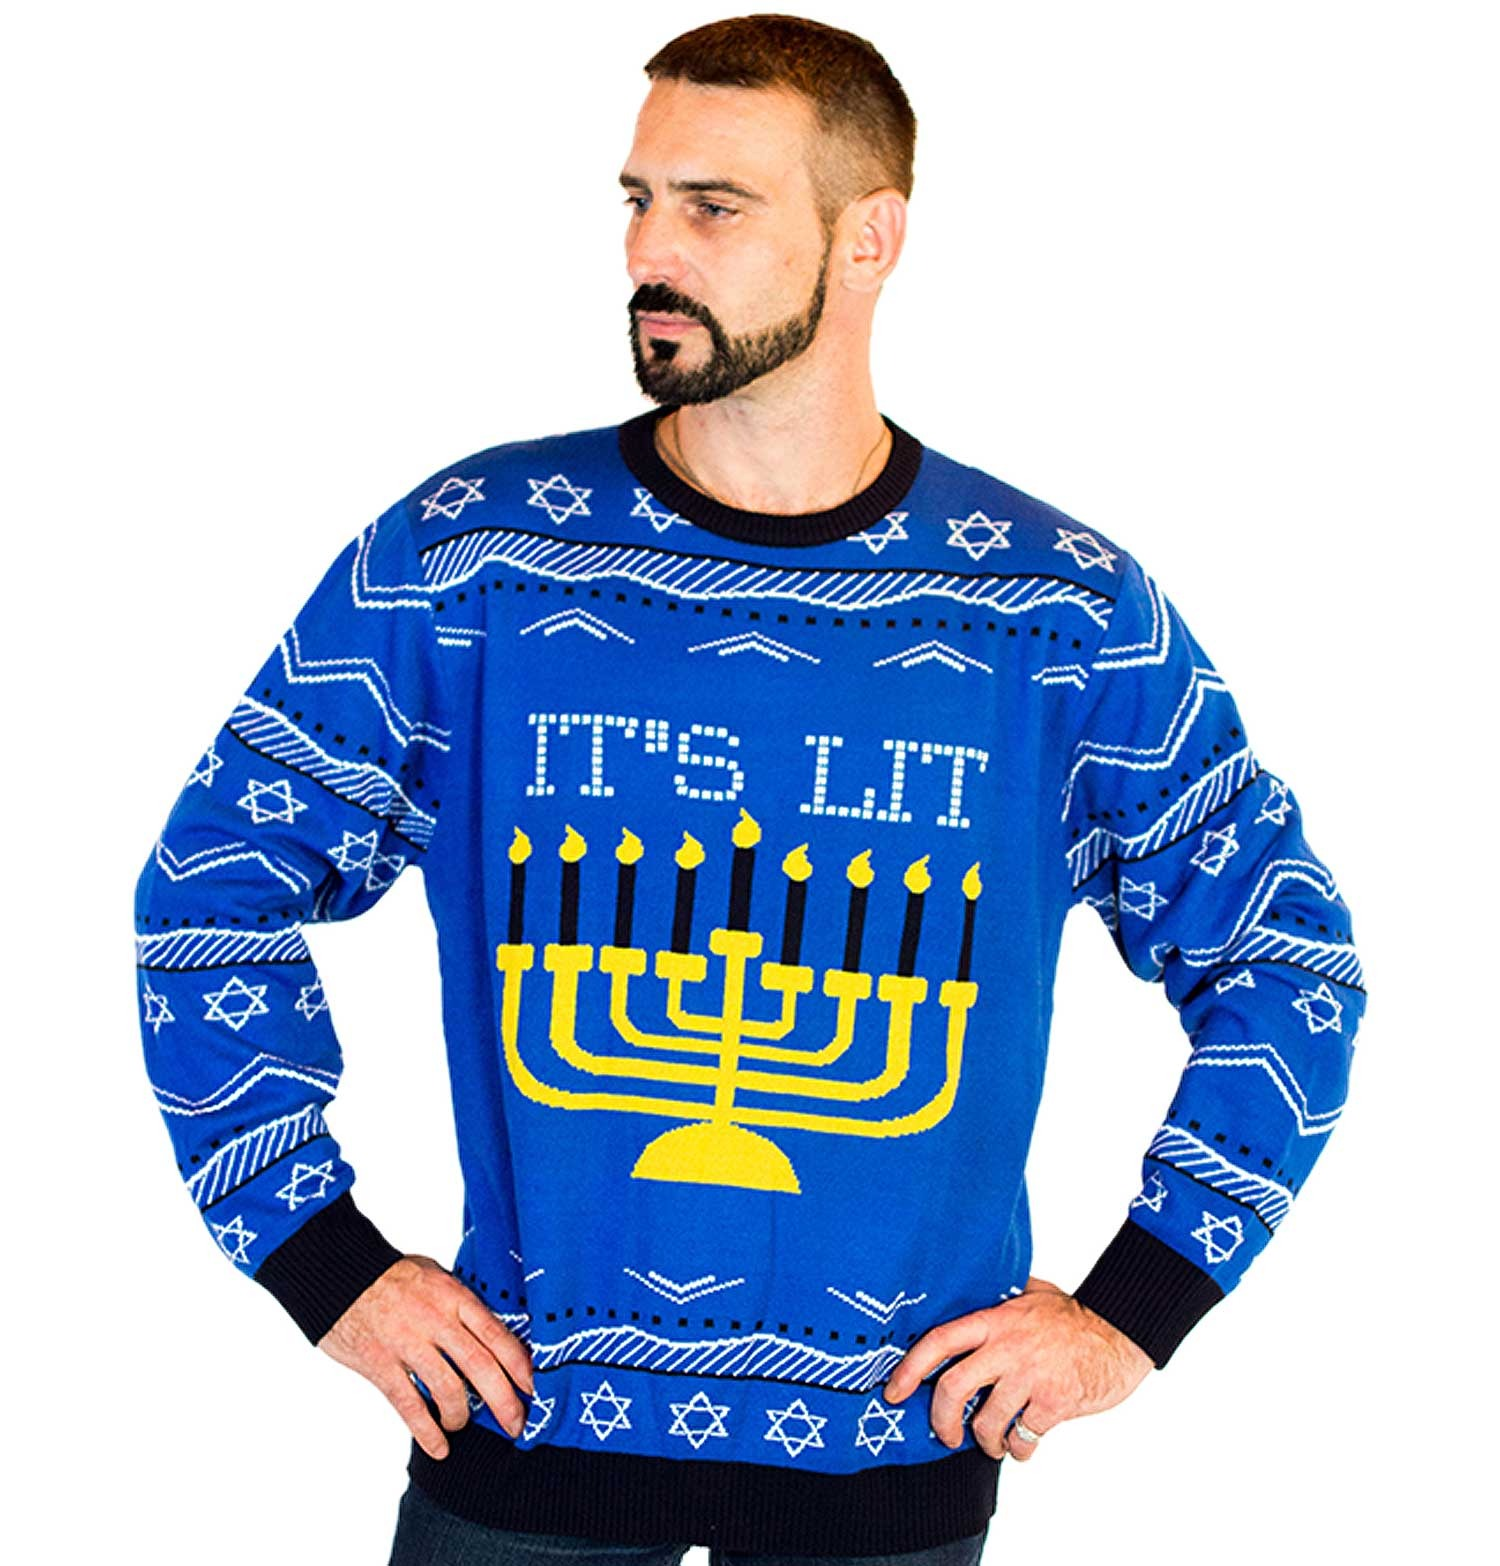 ugly Hanukkah sweater with menorah